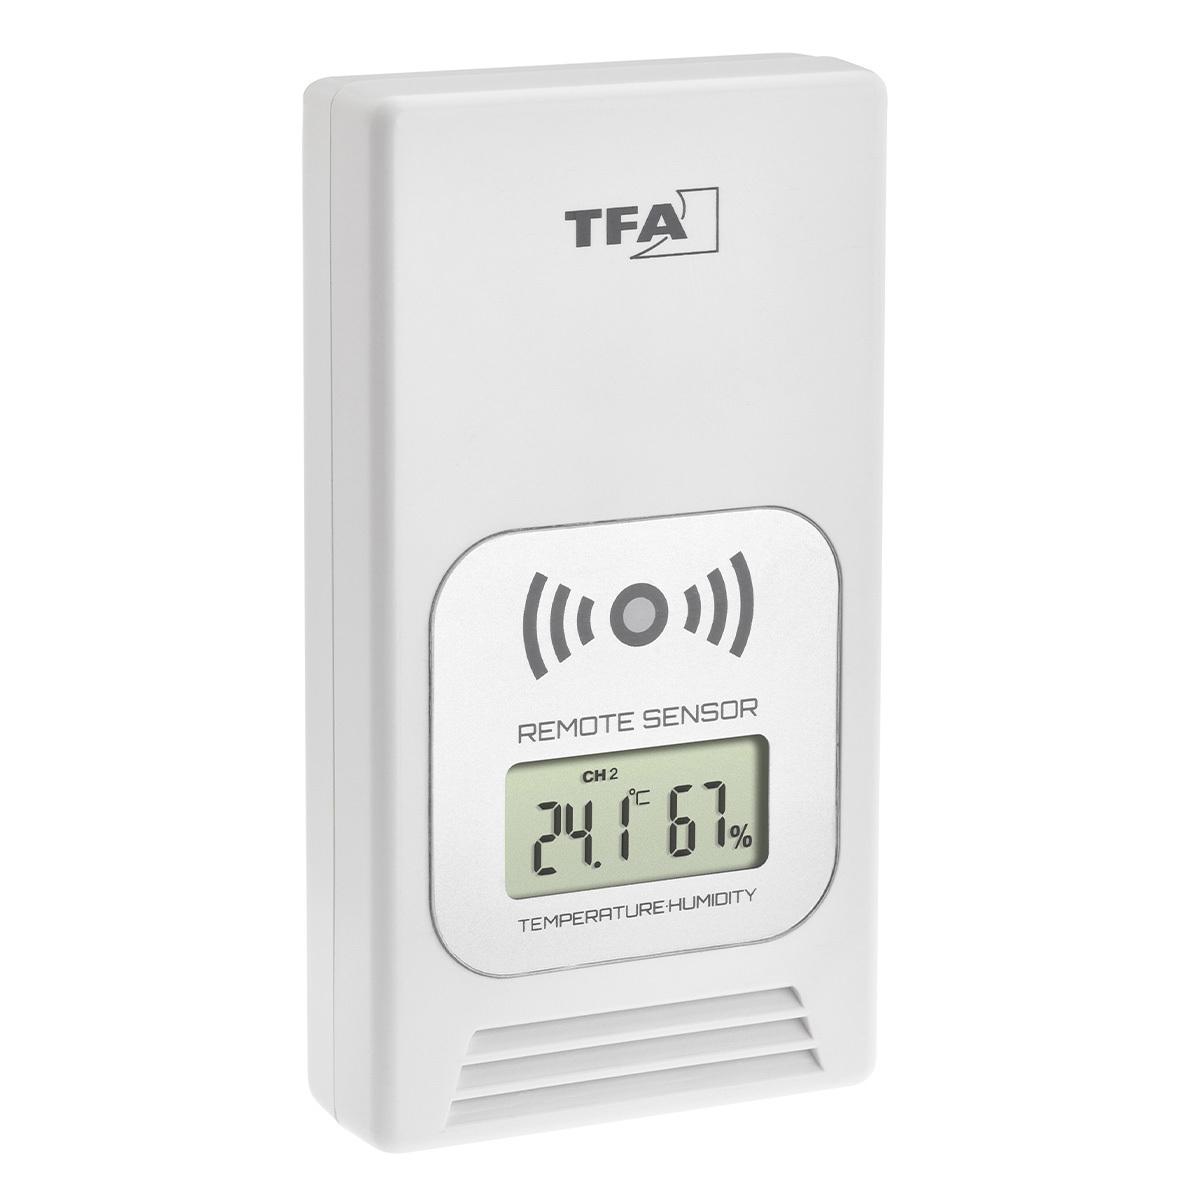 Датчик температуры/влажности с дисплеем TFA (30324102)